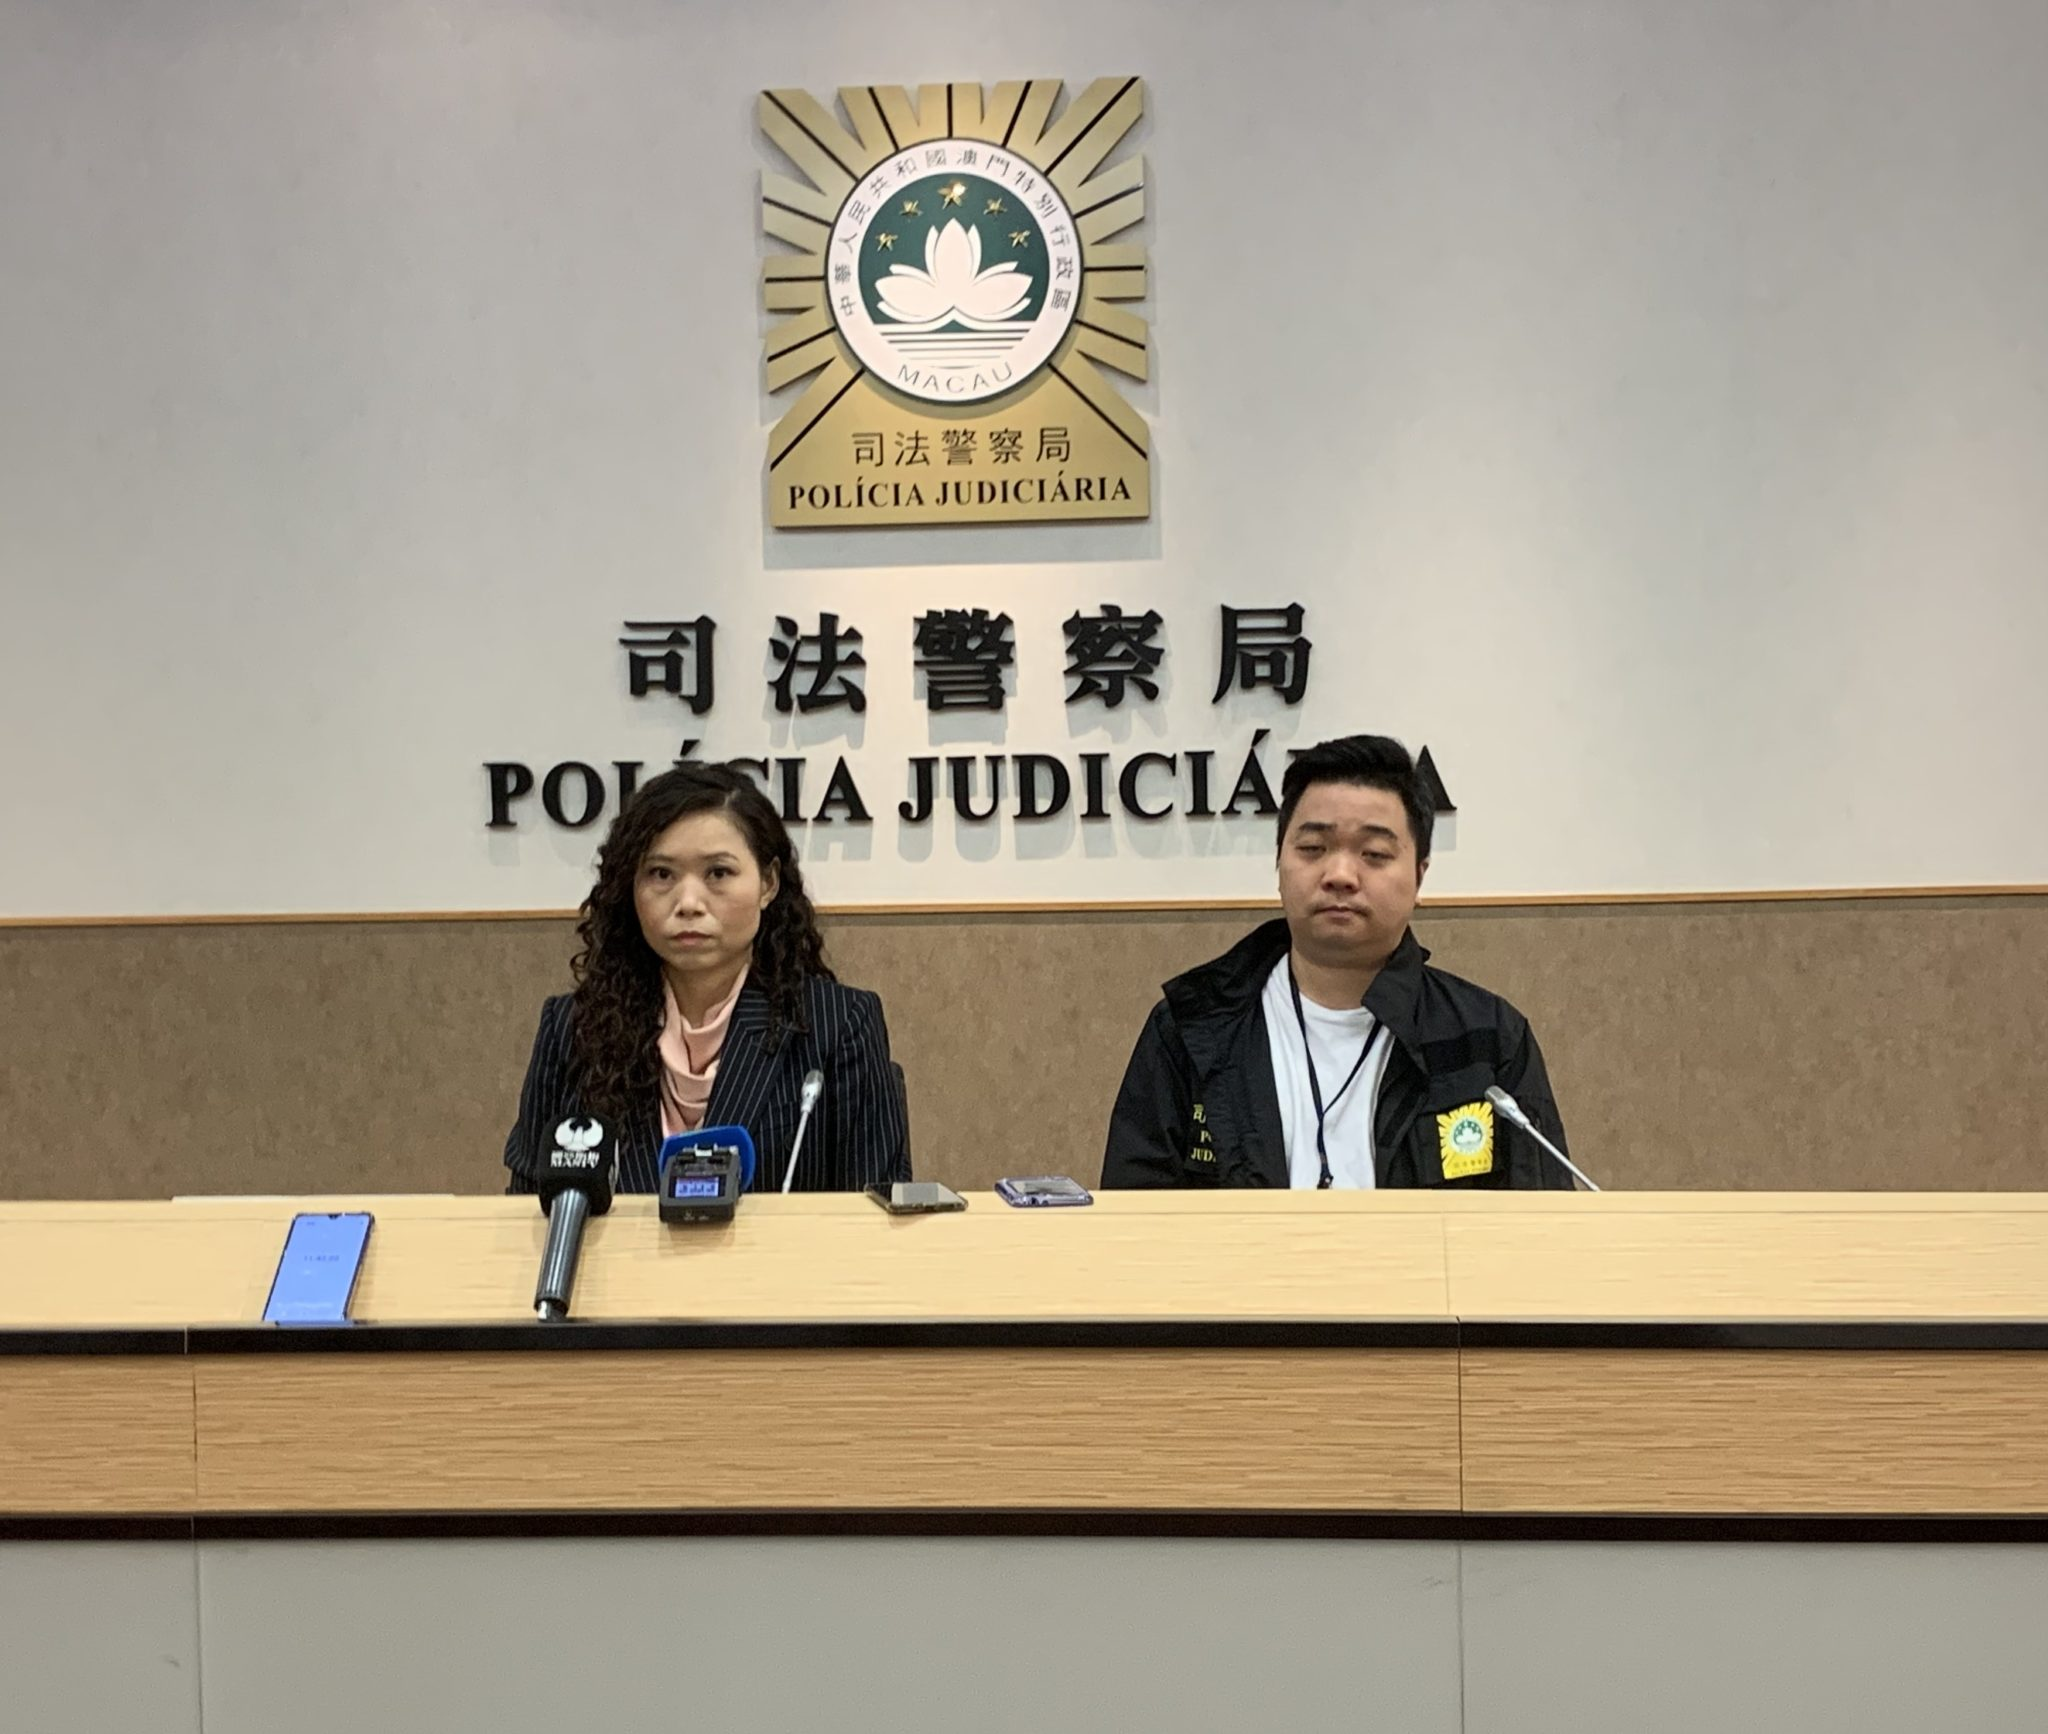 Vítima paga 25 mil renminbi após burla e pedido de resgate